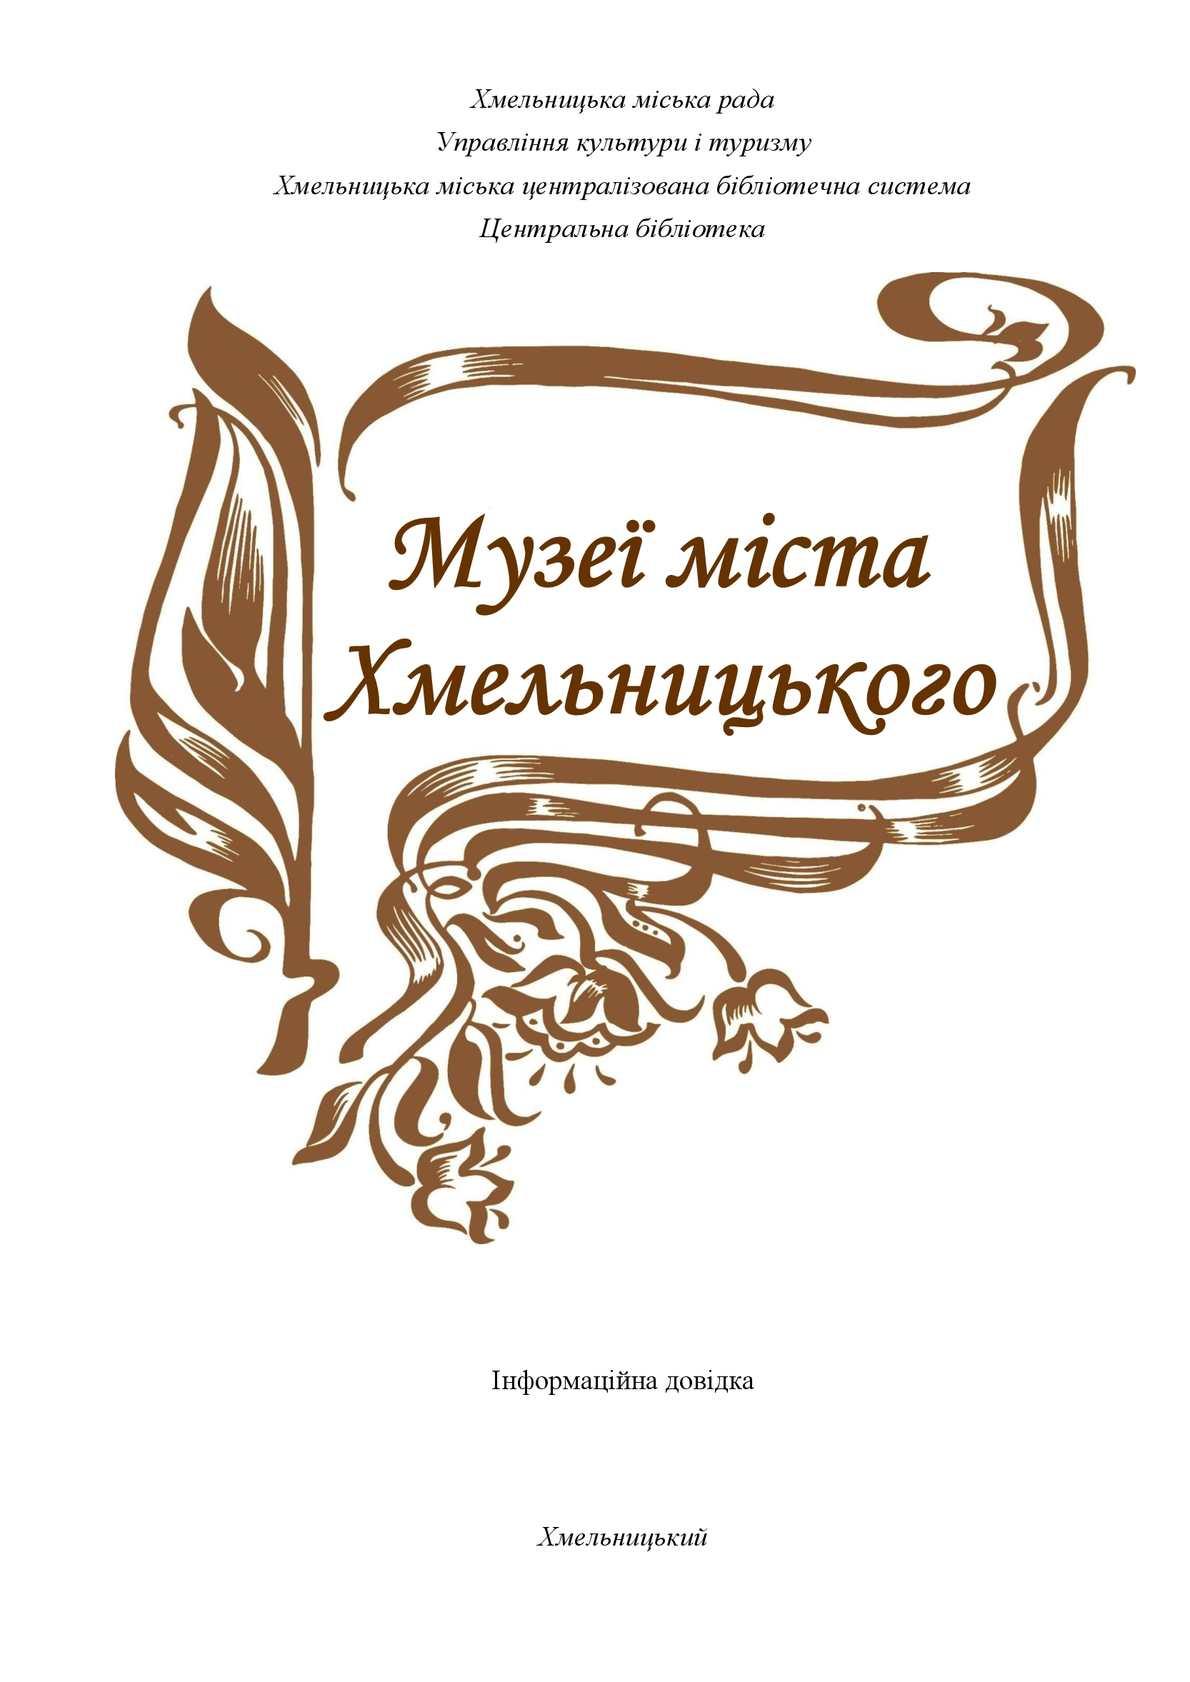 Calaméo - Музеї міста Хмельницького f1f10f0c80070